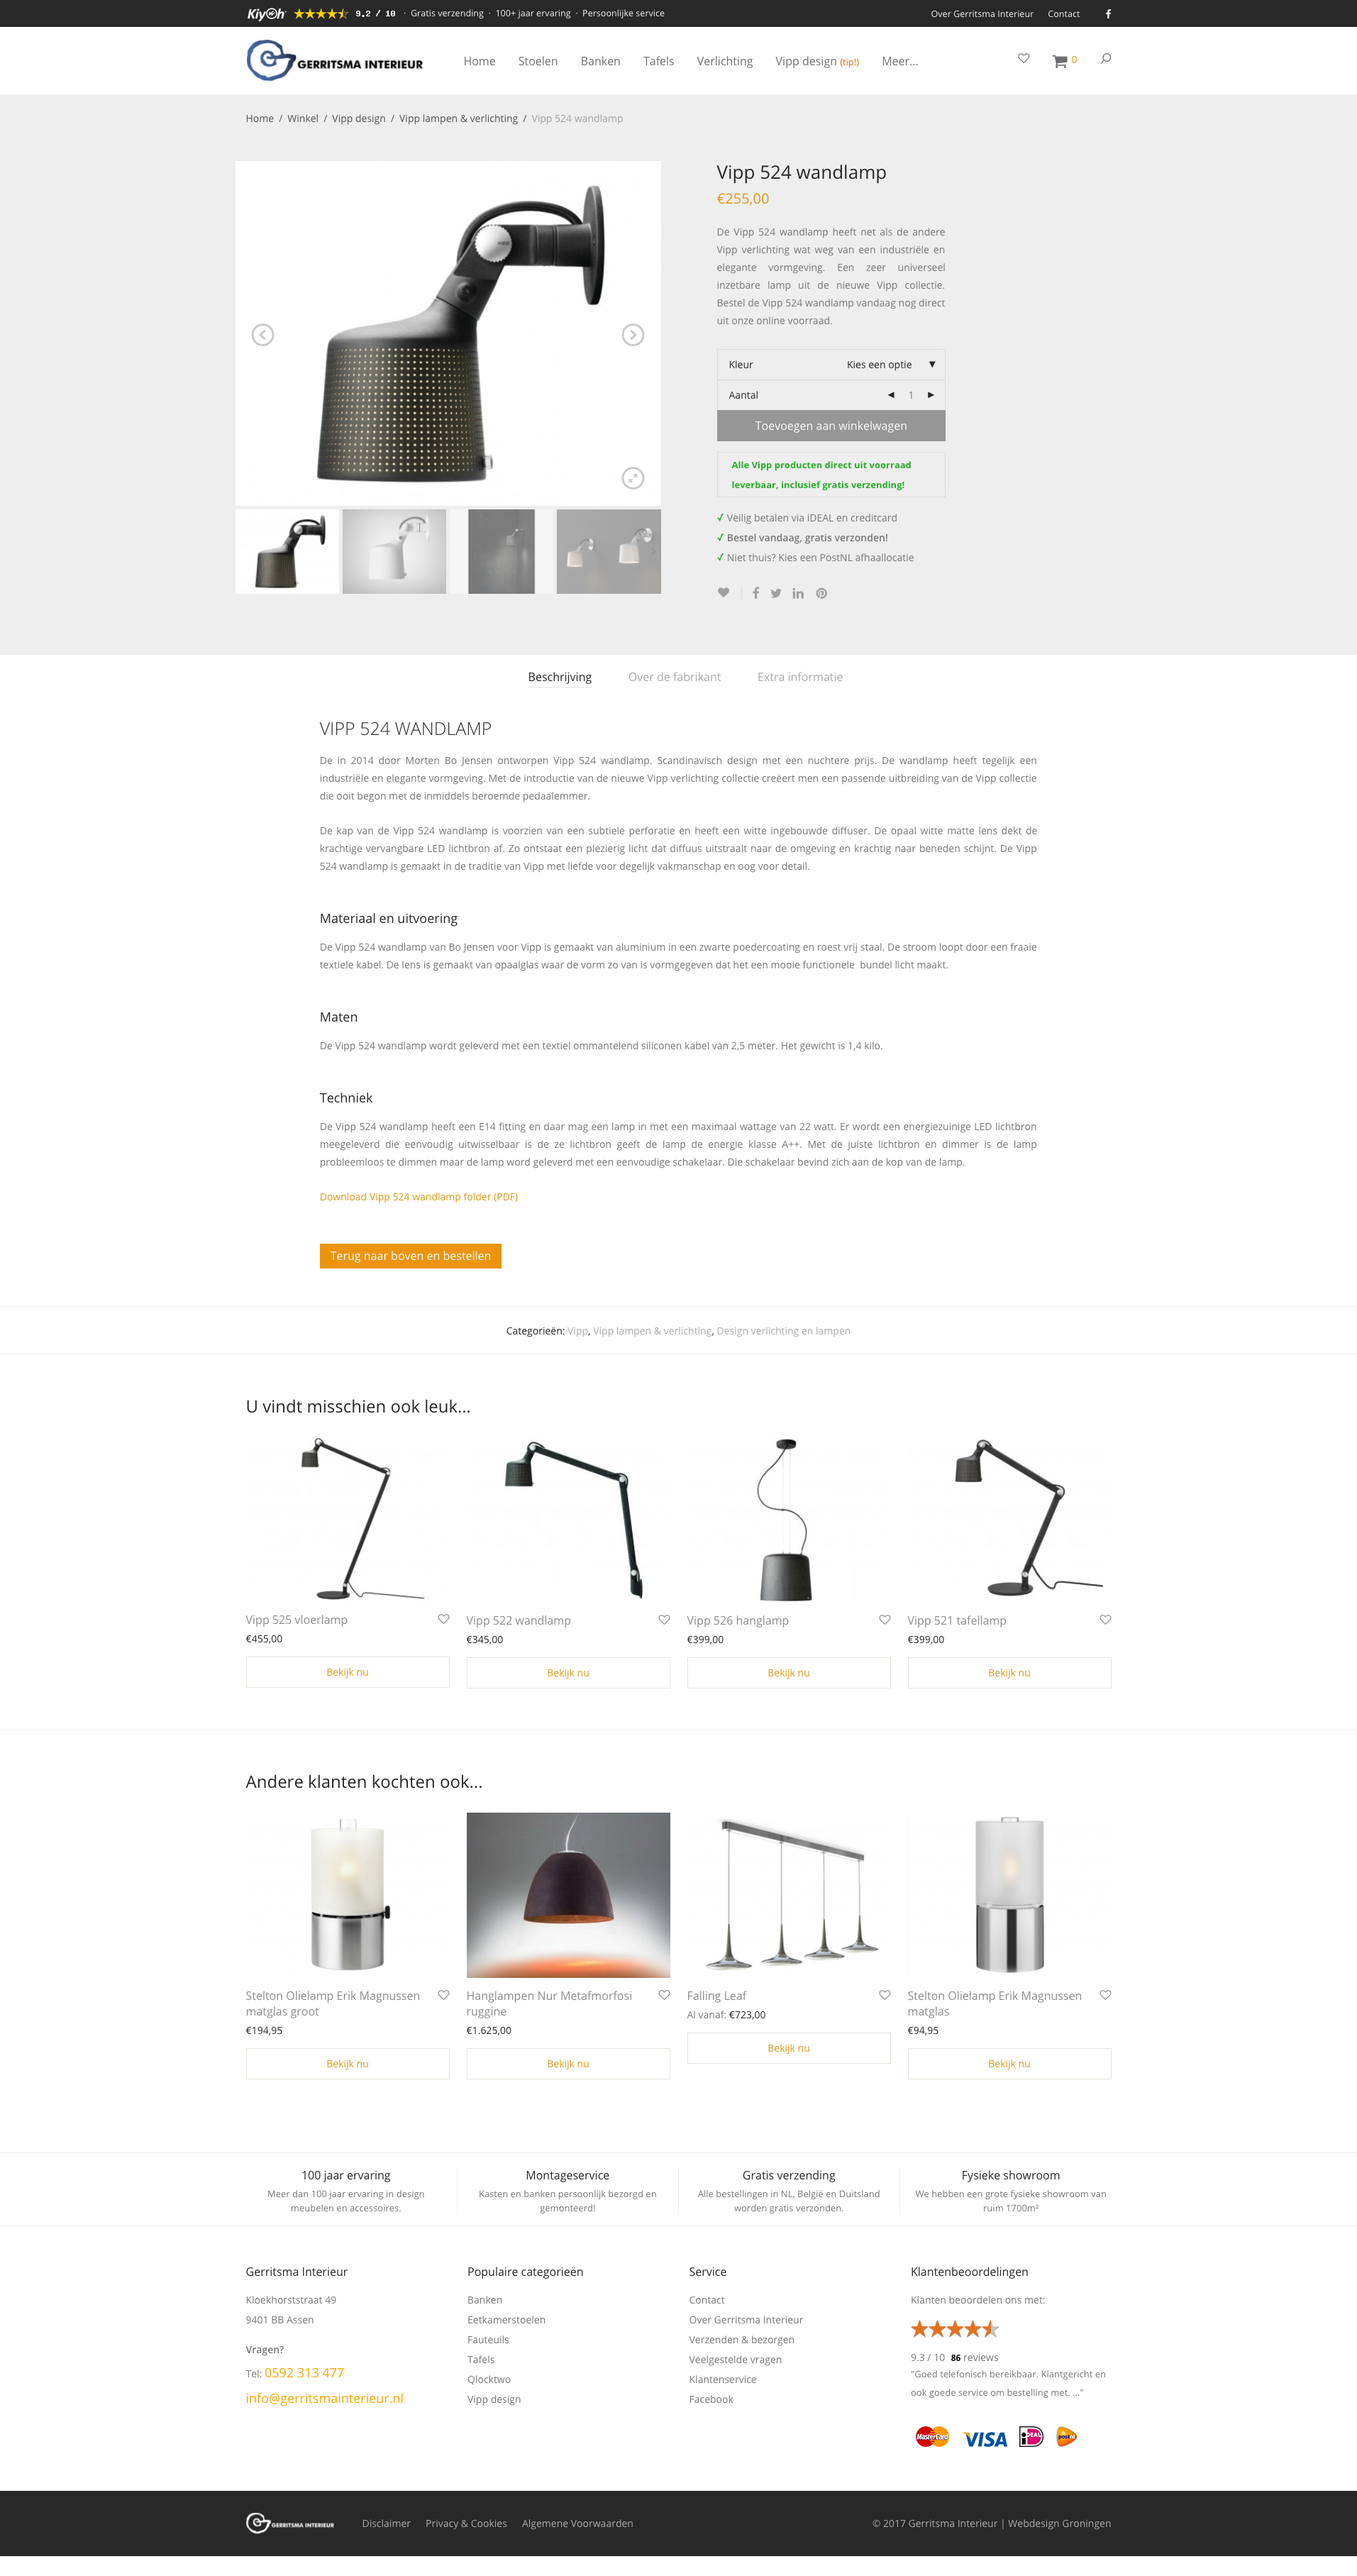 screencapture-gerritsmainterieur-nl-winkel-verlichting-vipp-524-wandlamp-1506621860946.png